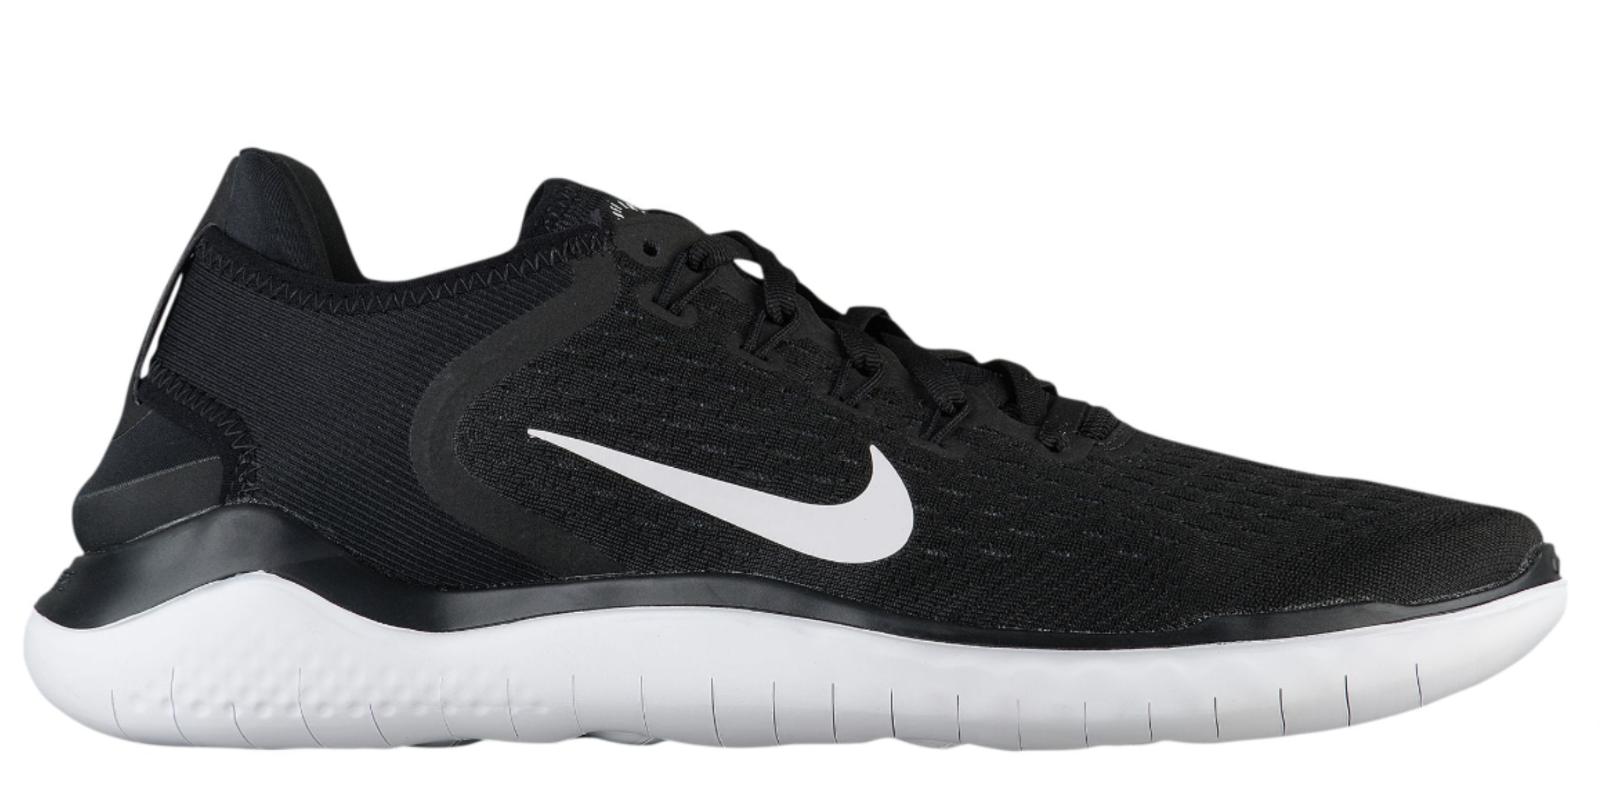 New NIKE FREE RN 2018 842836-001 - MEN'S Black/White Running Shoes c1